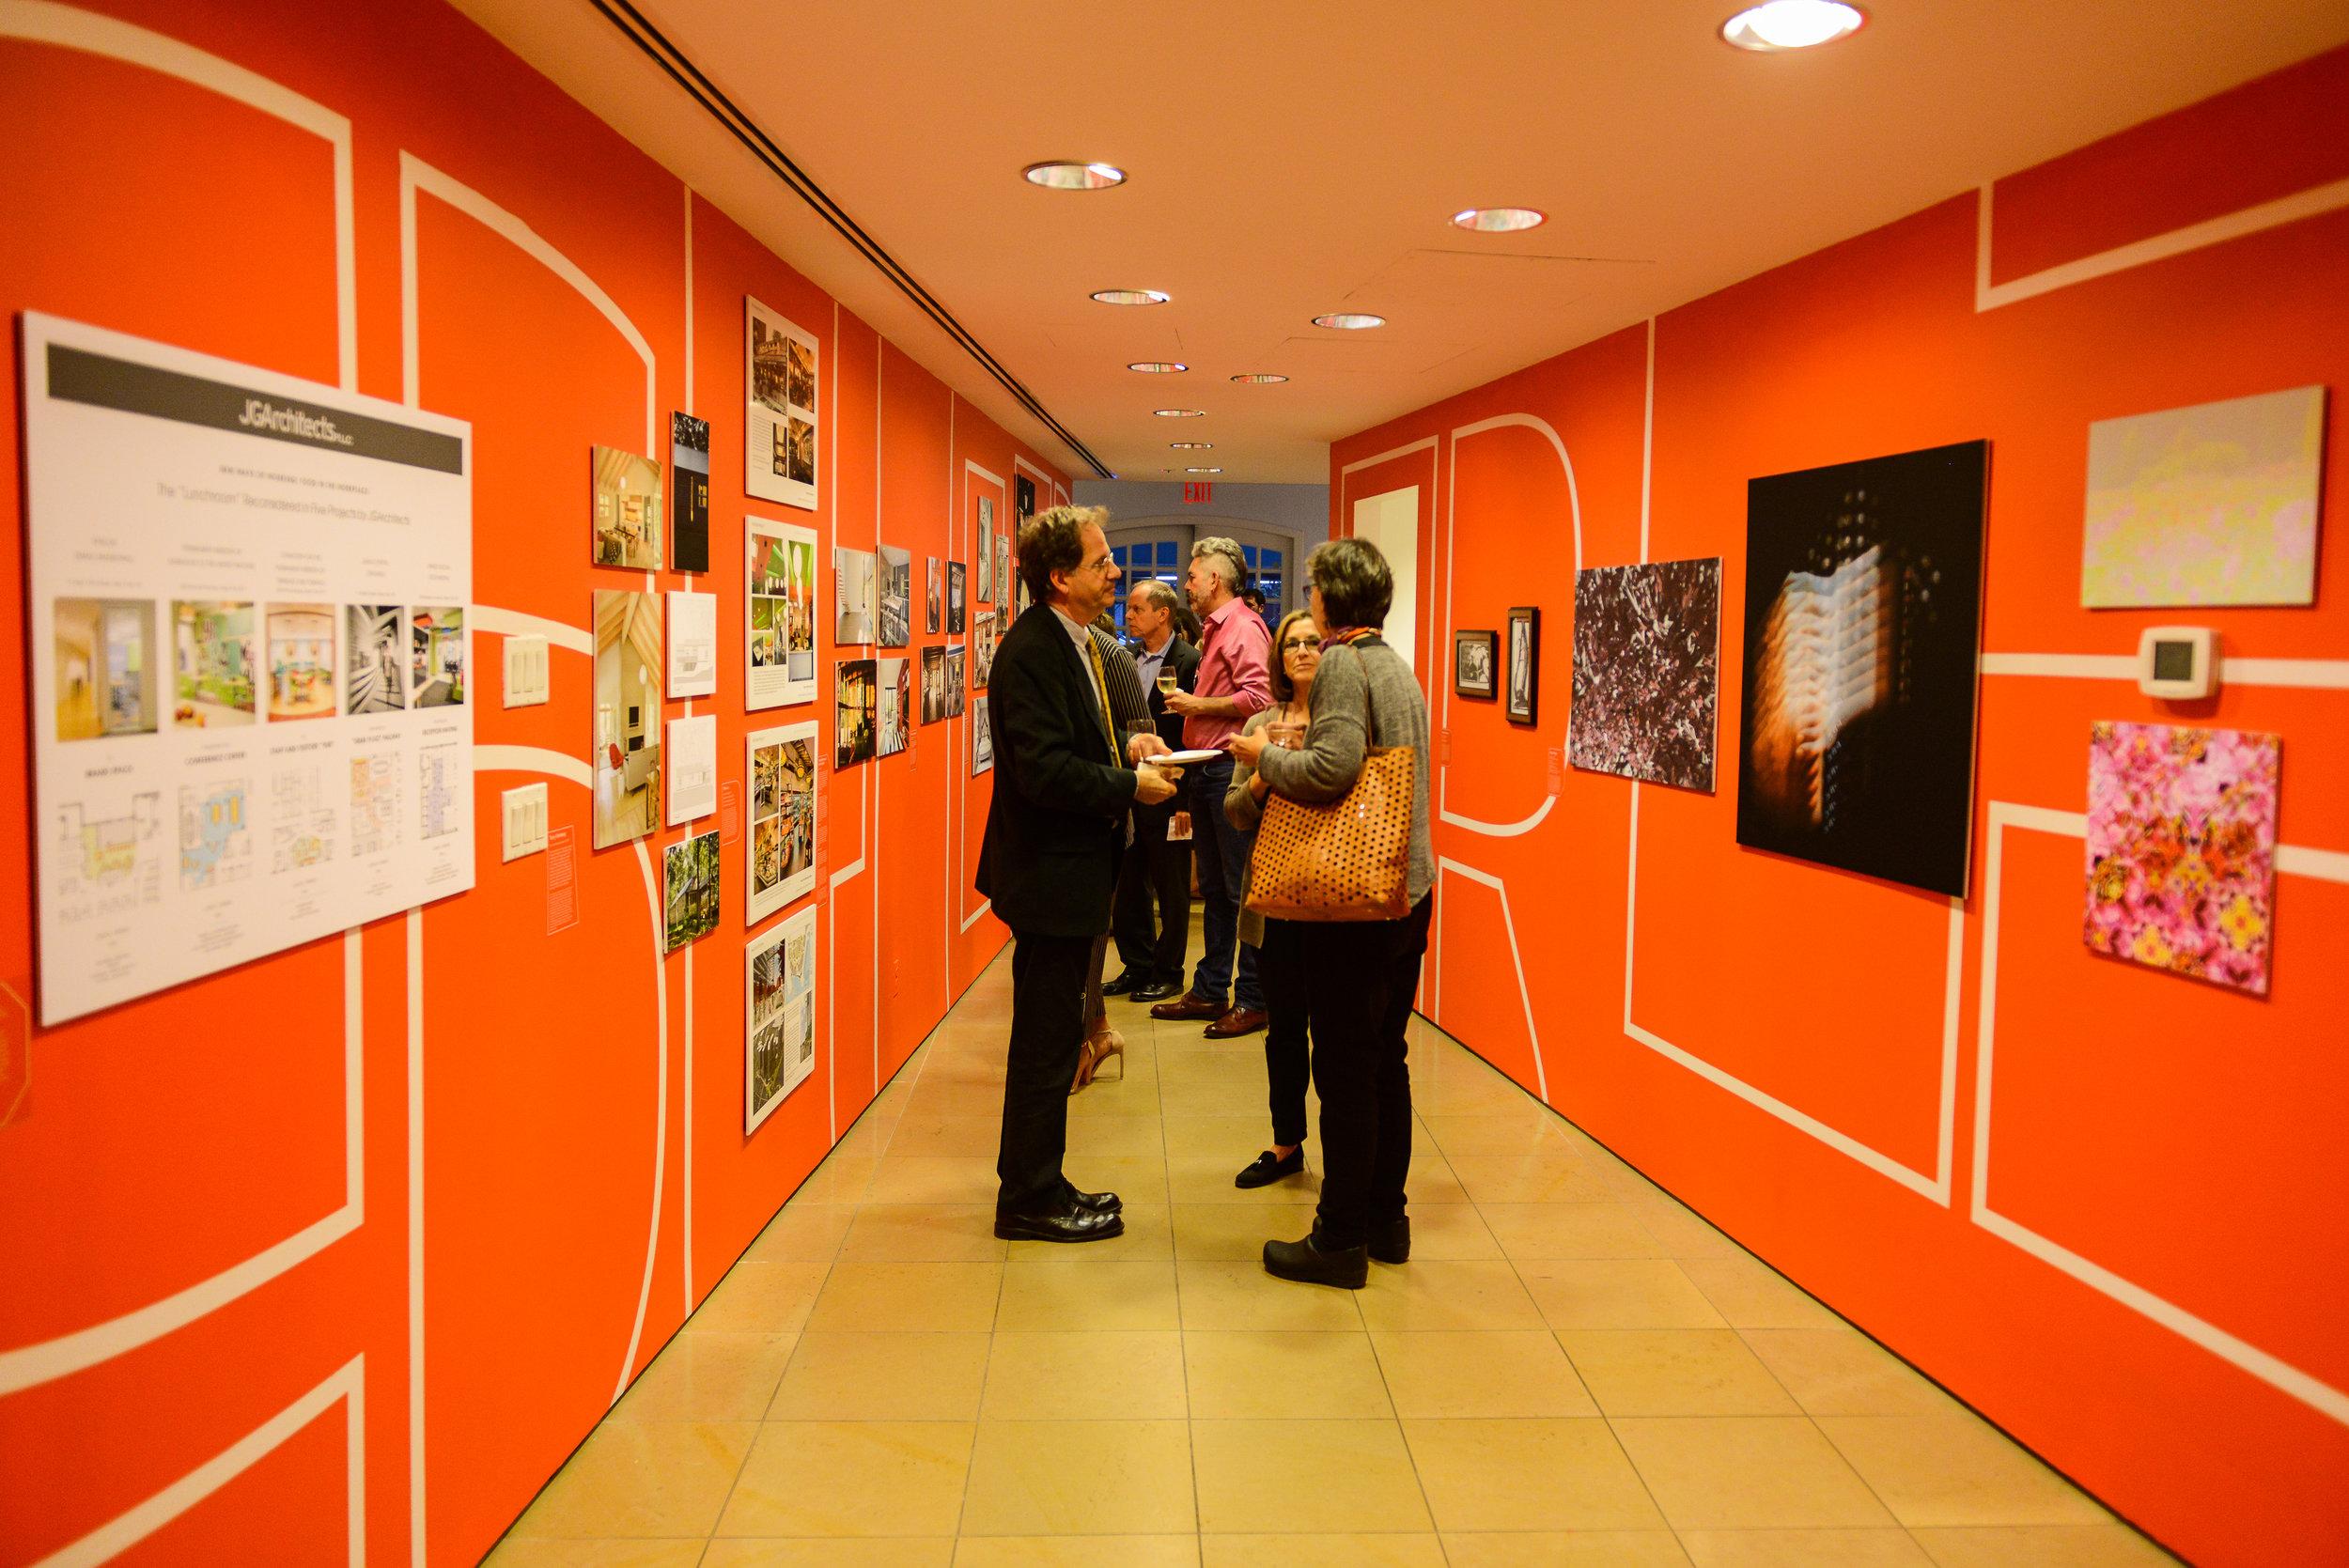 nysid-galleryhallway-from-69th-street-lobby-faculty-exhibition-2017_40028435535_o[1].jpg